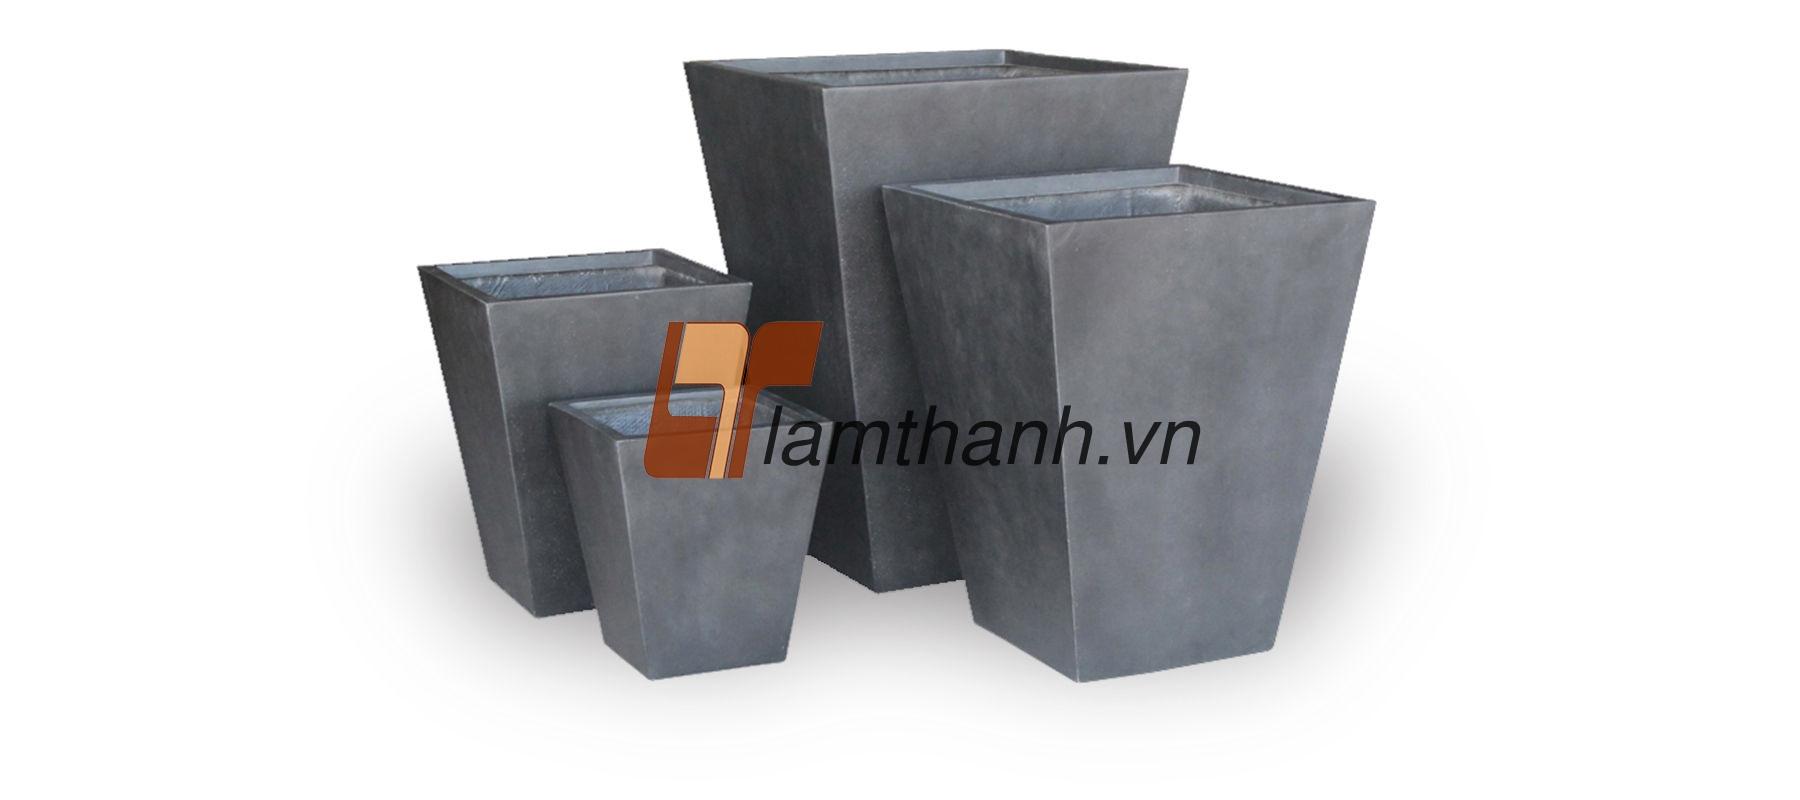 vietnam polystone, fiberstone 09